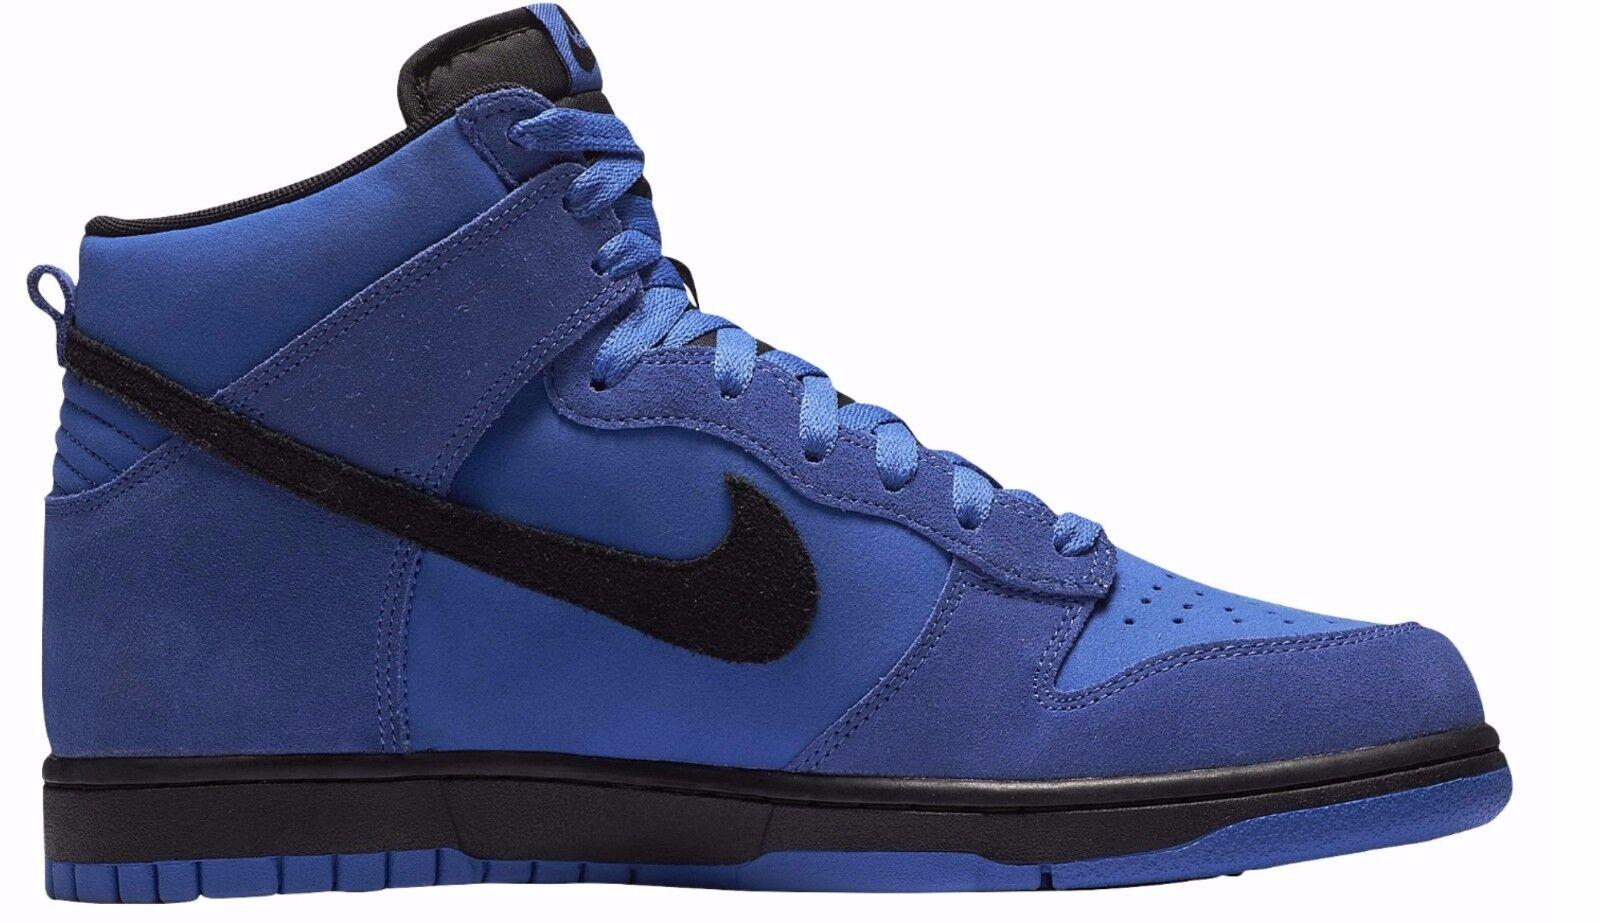 New  NIKE DUNK HI Comet Blue Black Shoes High force one 904233-002 Retro c1